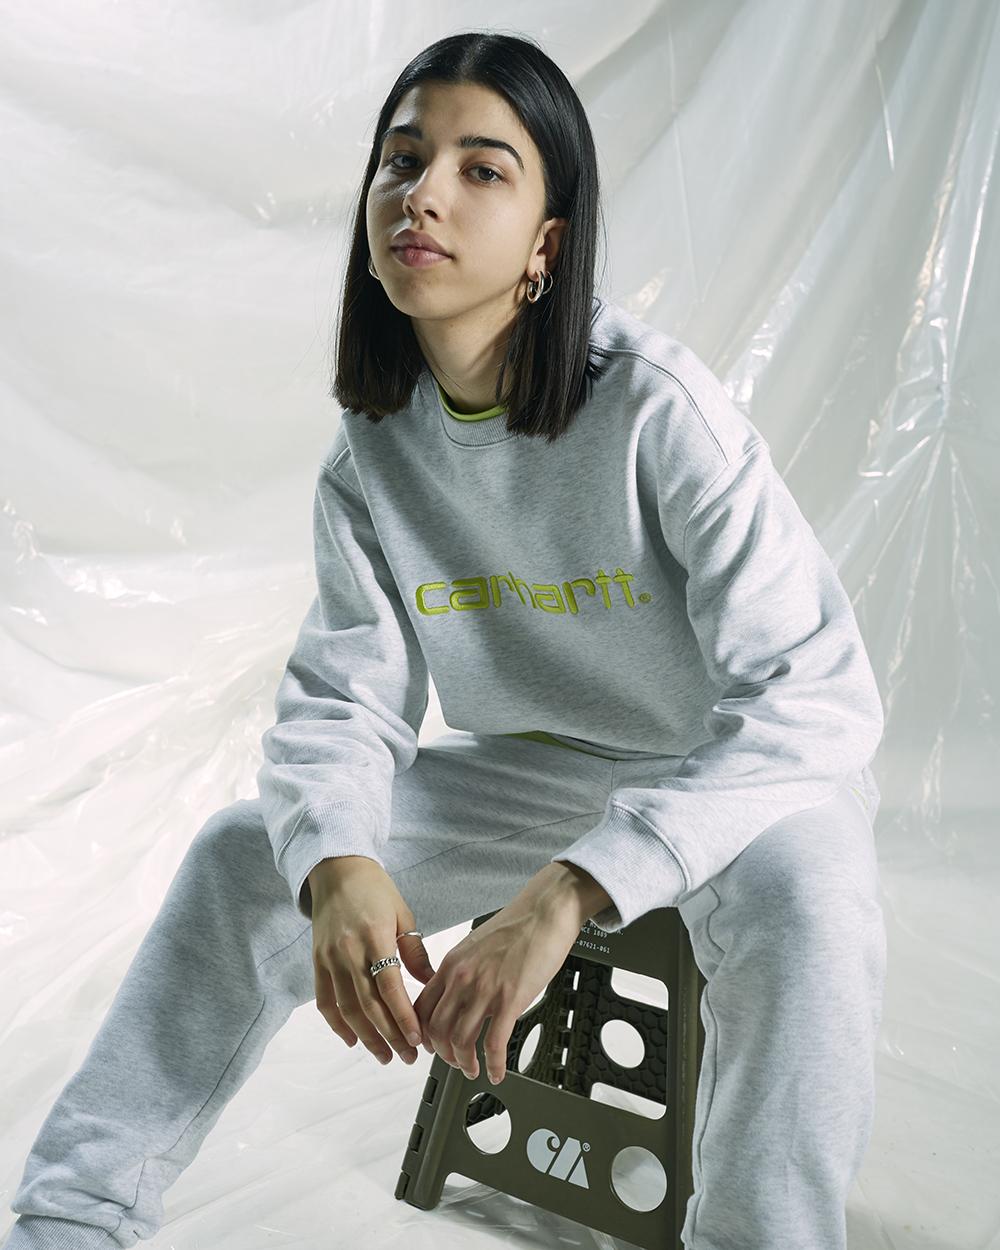 Carhartt WIP - Carhartt Sweatshirt